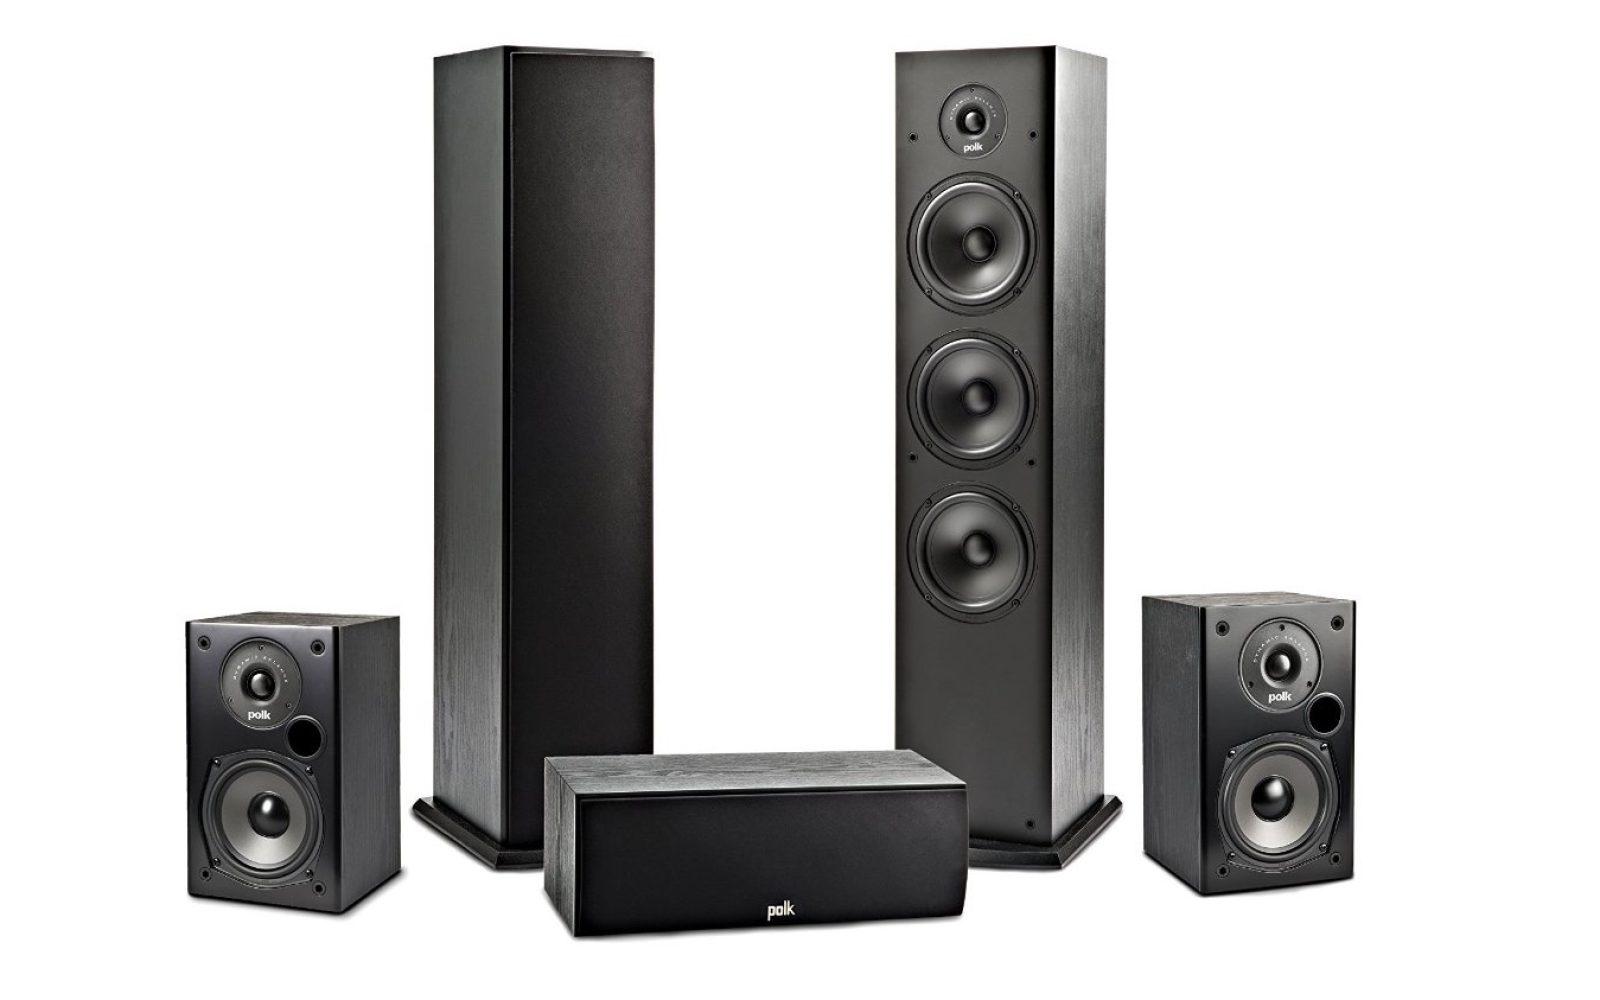 Save 50 On Polks Audio T15 Bookshelf Speakers At Amazon Shipped Reg 100